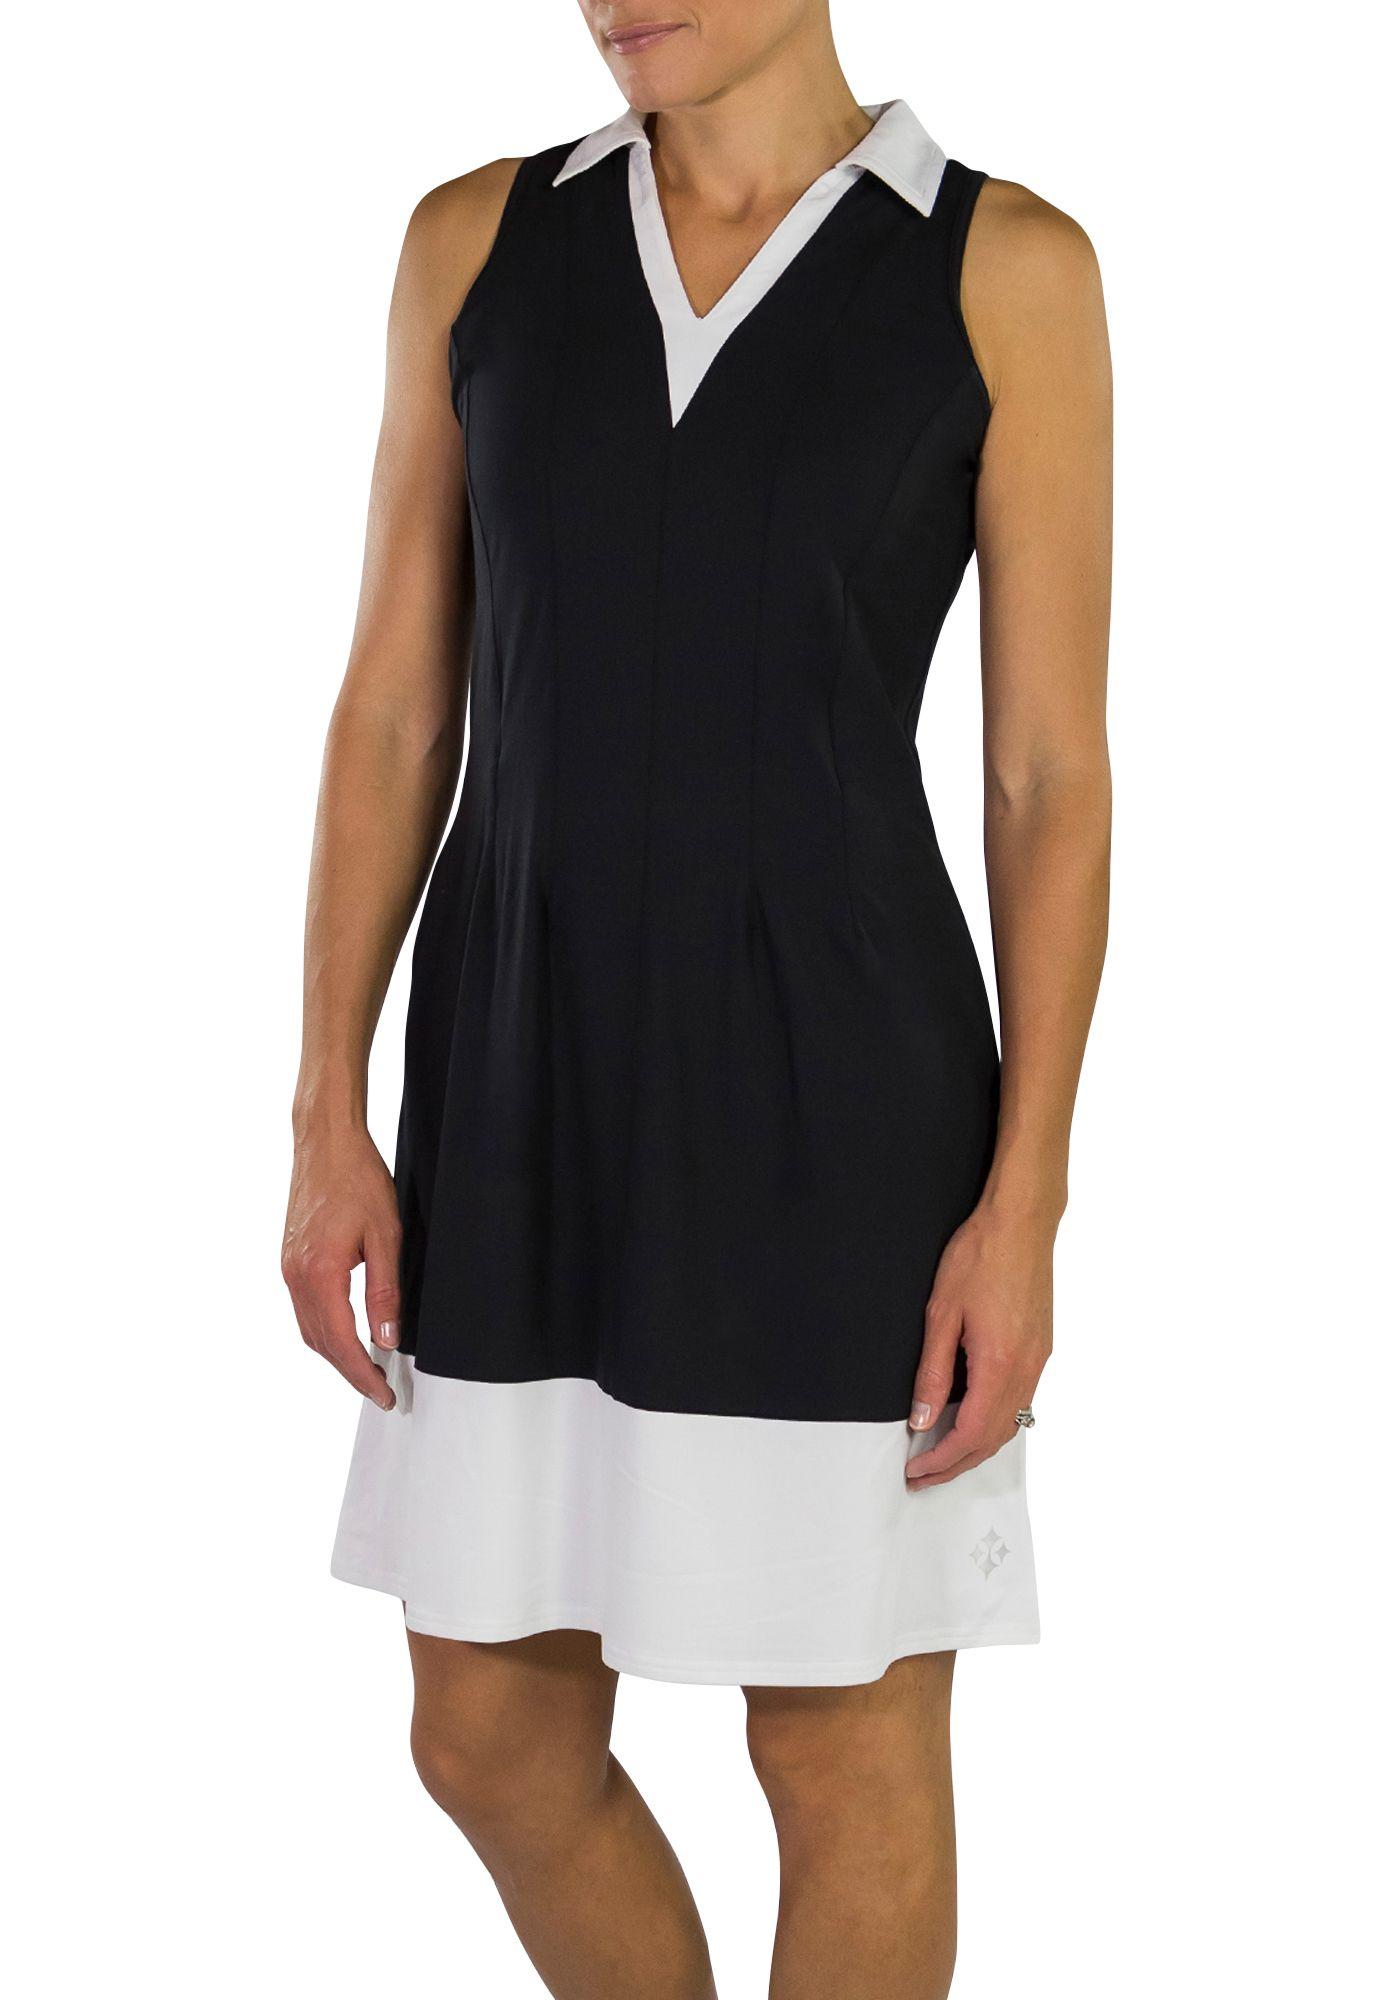 Jofit Women's Spin Golf Dress